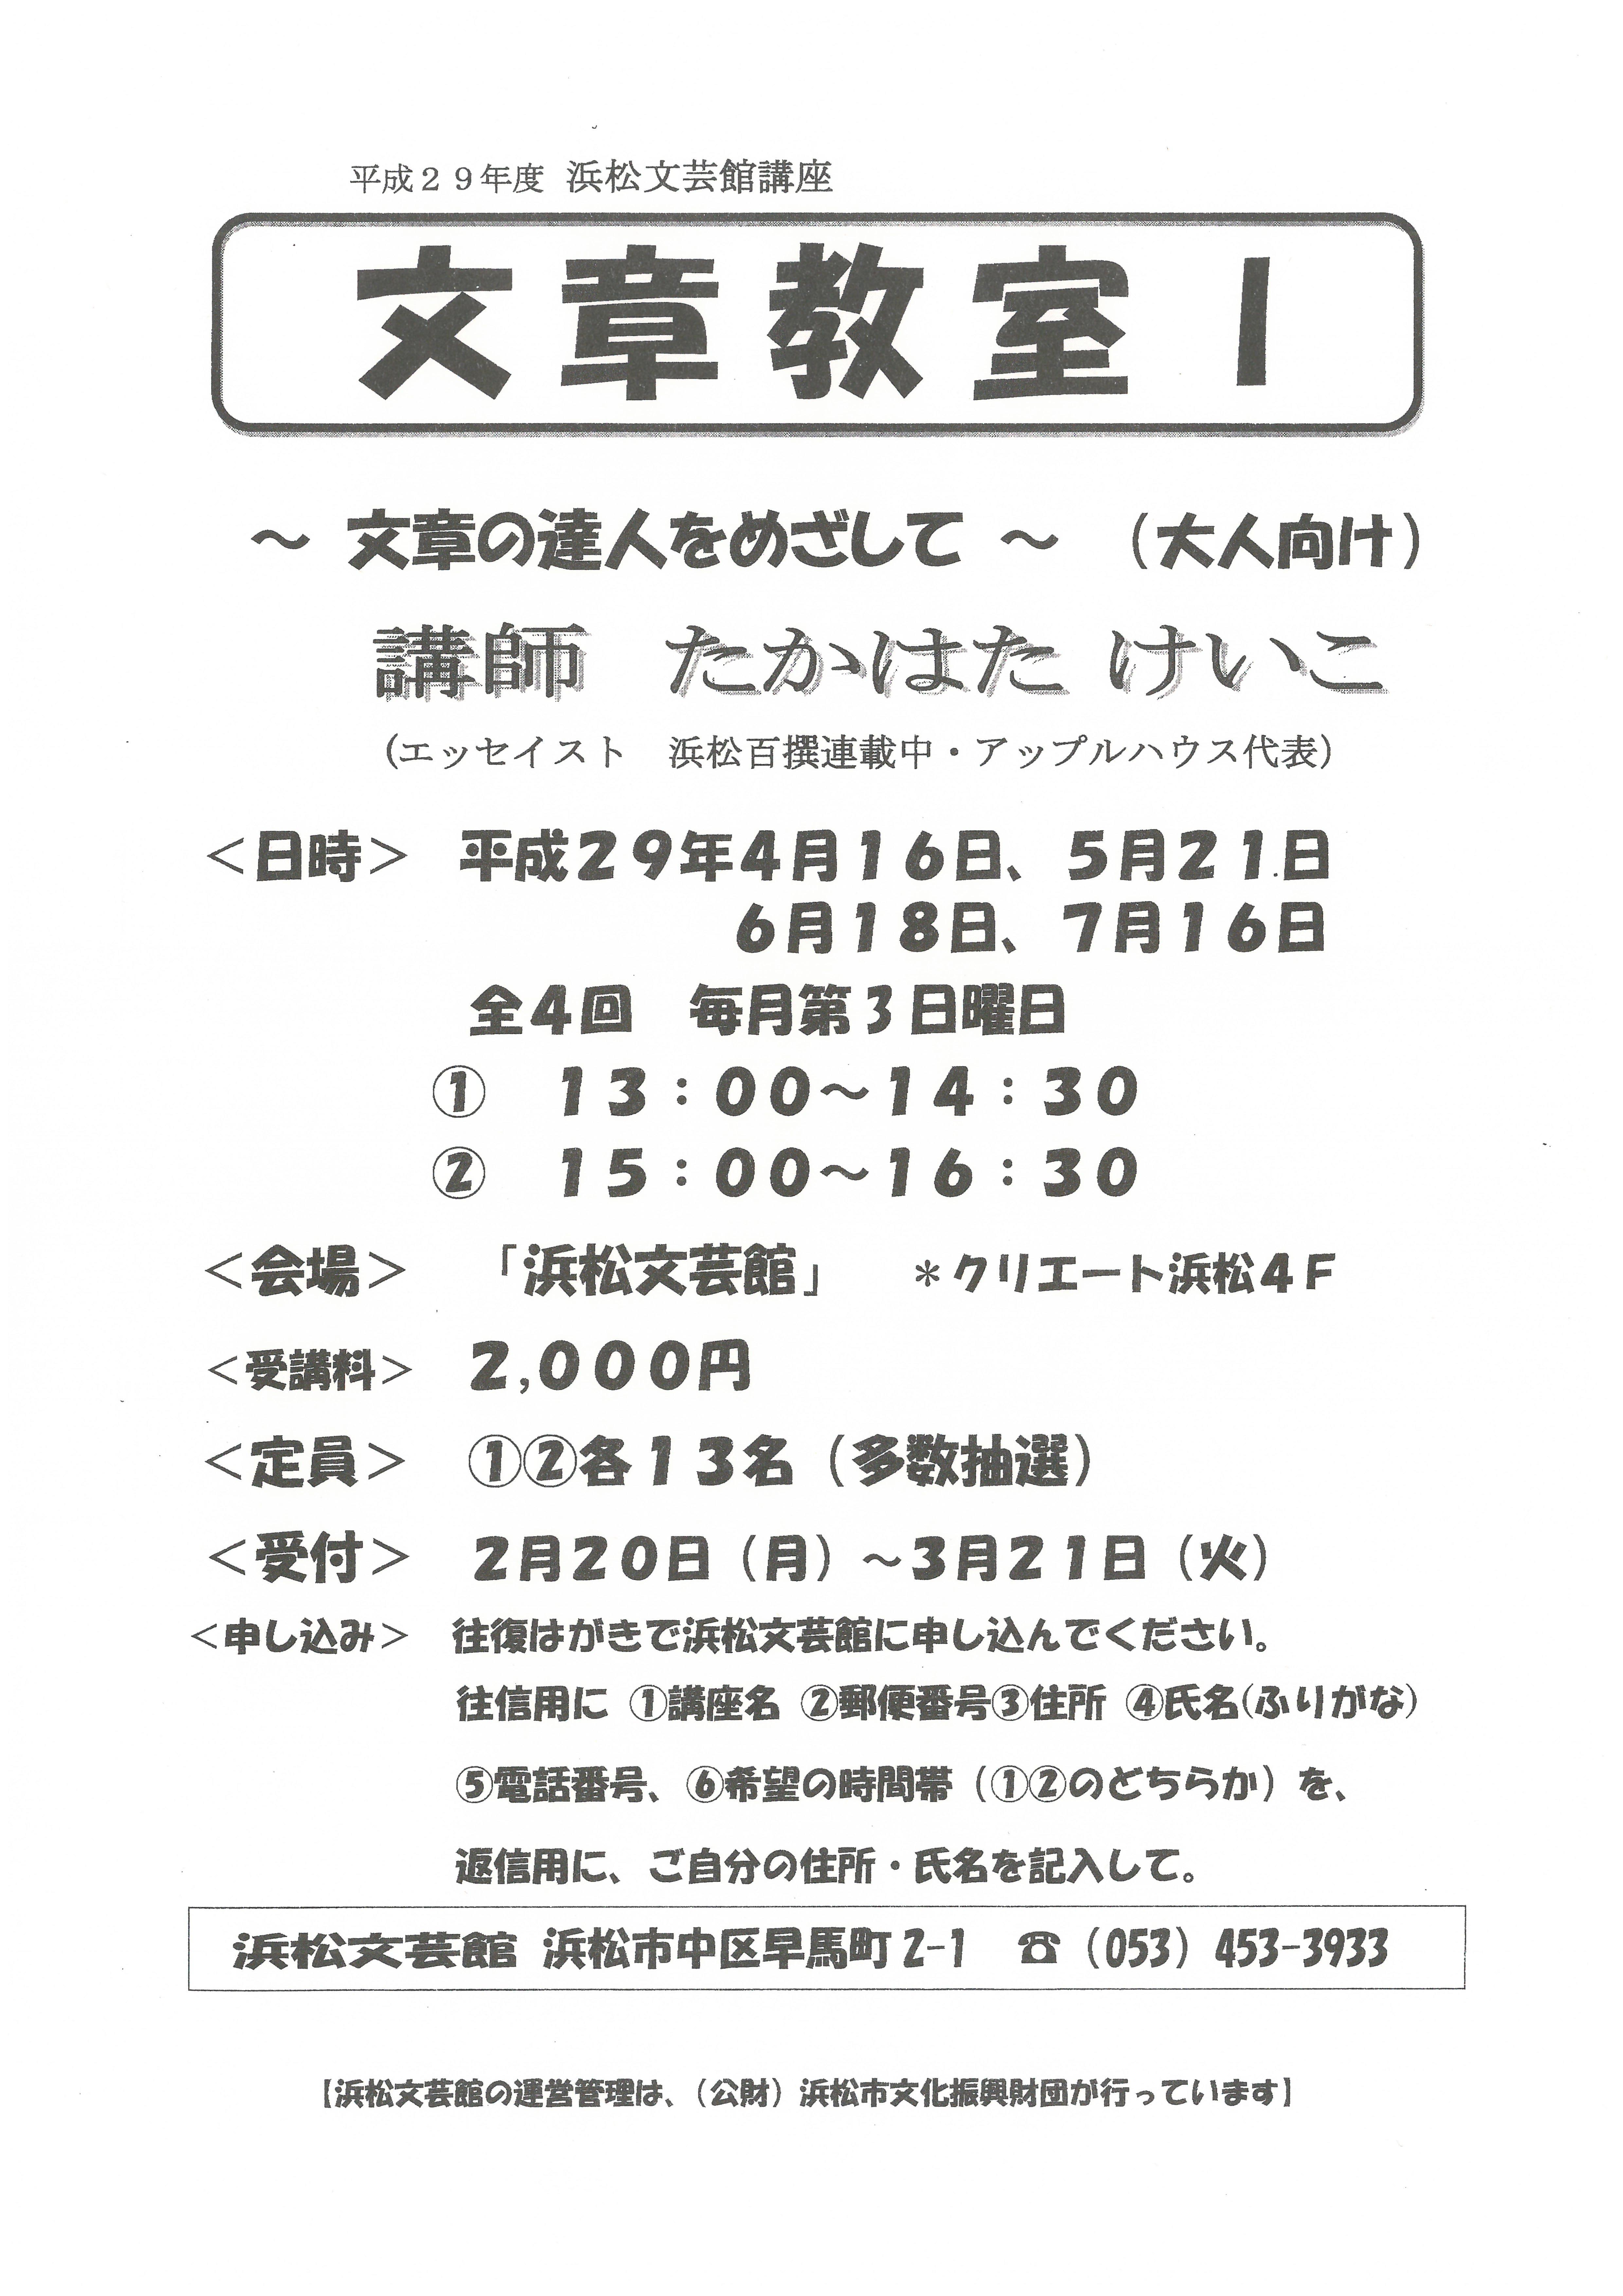 http://www.hcf.or.jp/facilities/create/project/SKM_C364e17022120410_0001.jpg